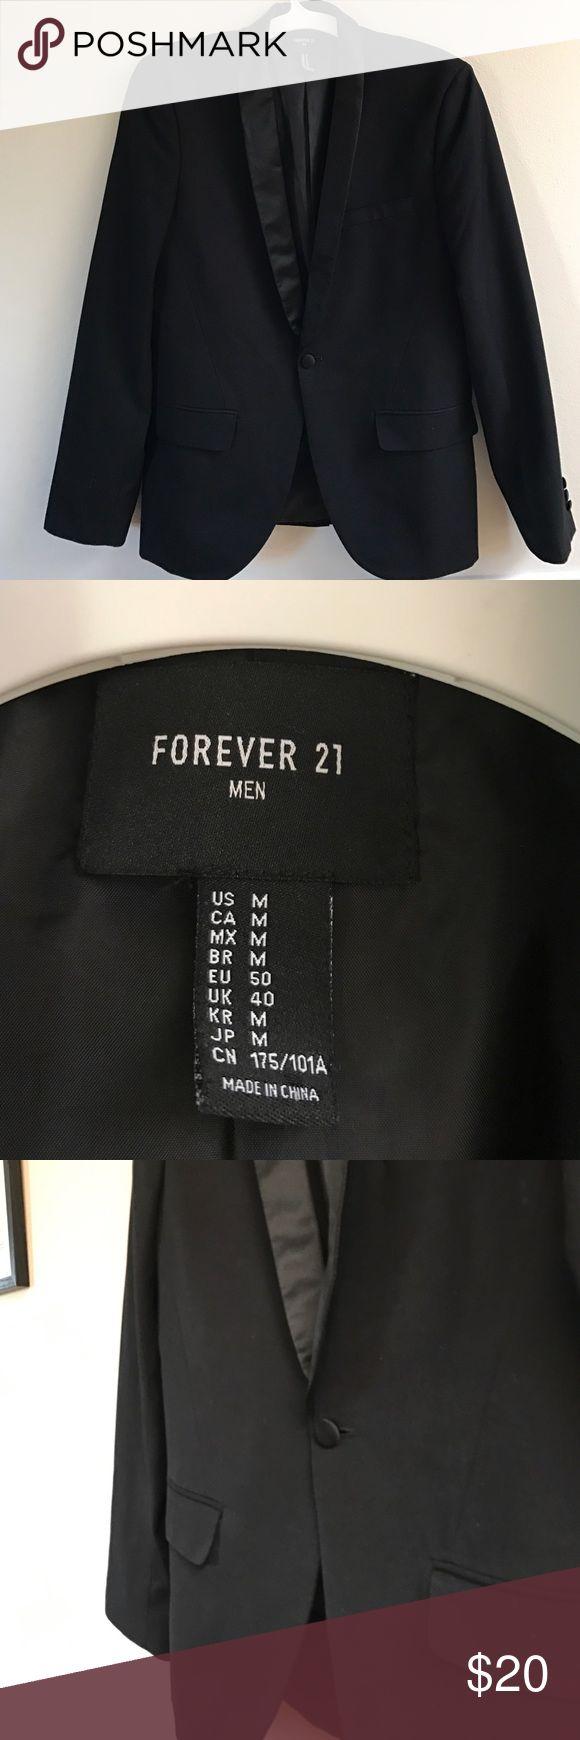 Blazer Type : blazer , brand  : Forever 21  color :black , size : M Forever 21 Suits & Blazers Sport Coats & Blazers